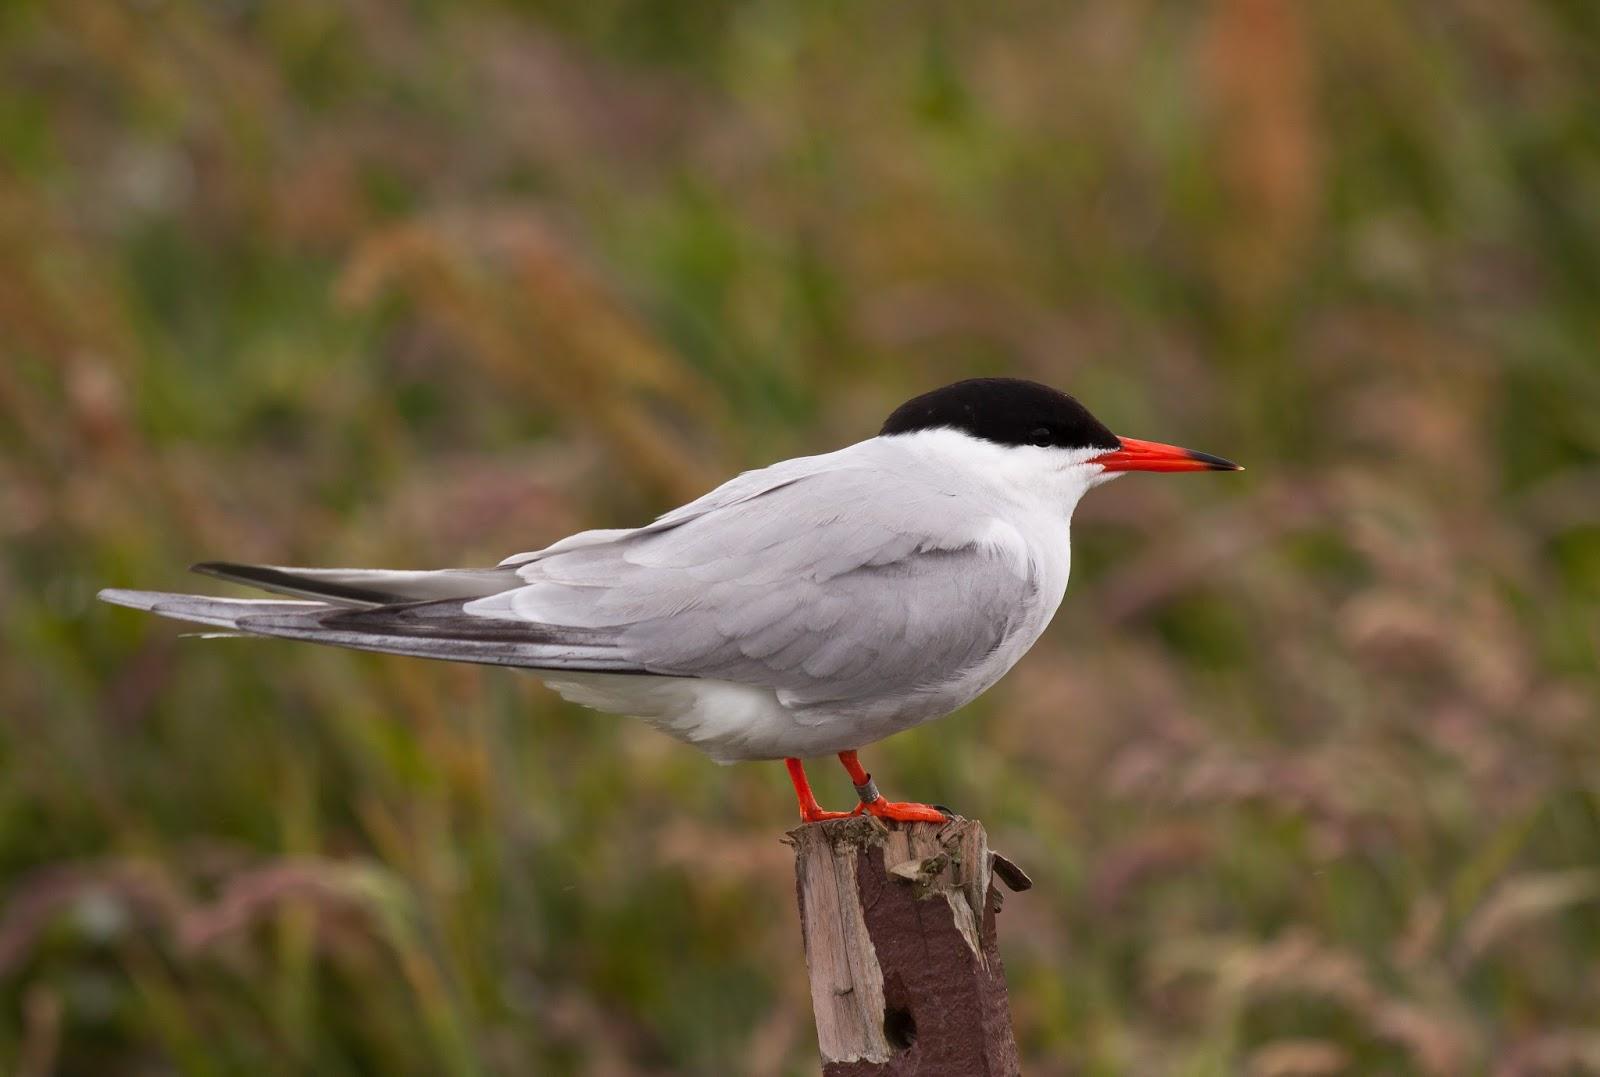 Common Tern - Farne Islands, Northumberland